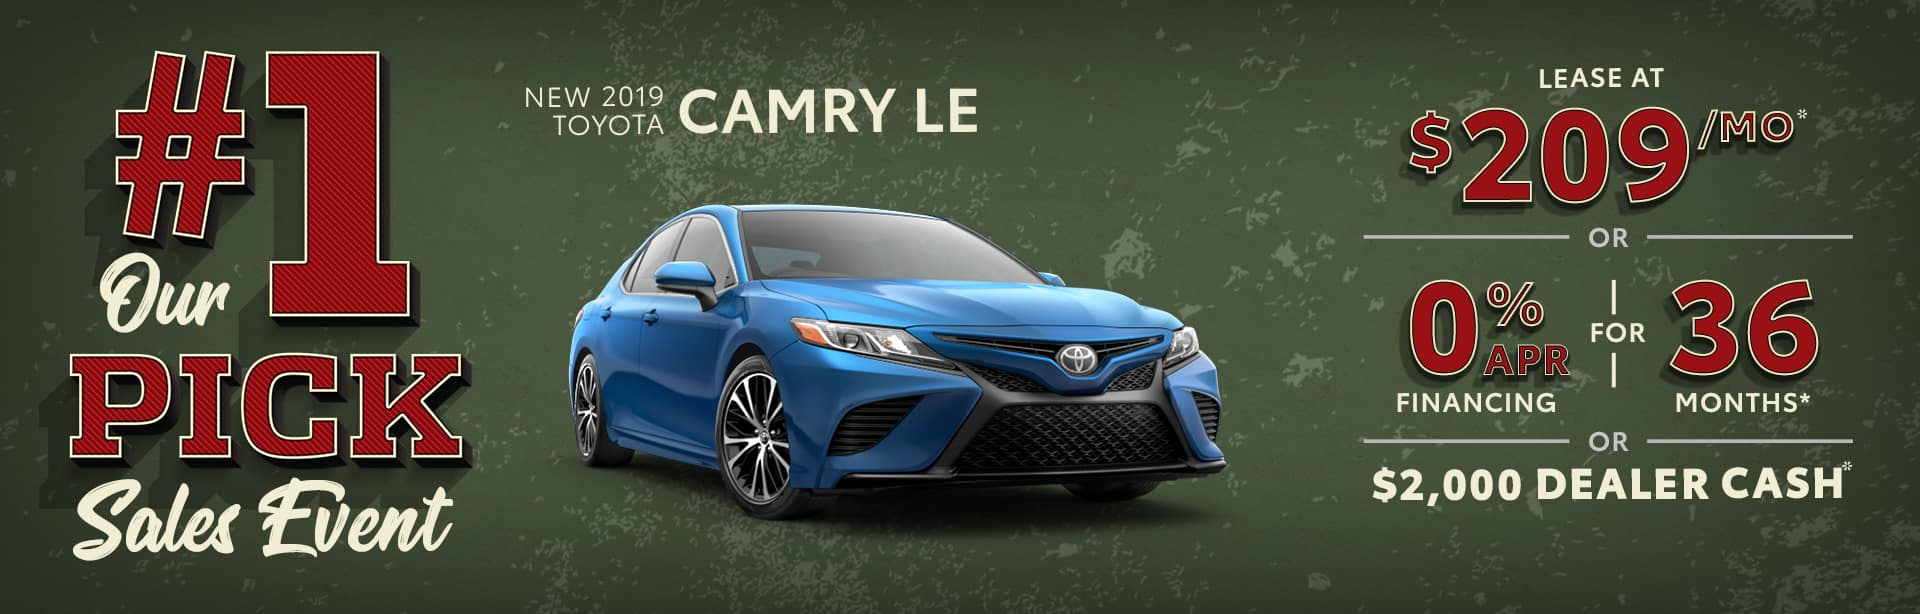 New 2019 Toyota Camry Albertville AL